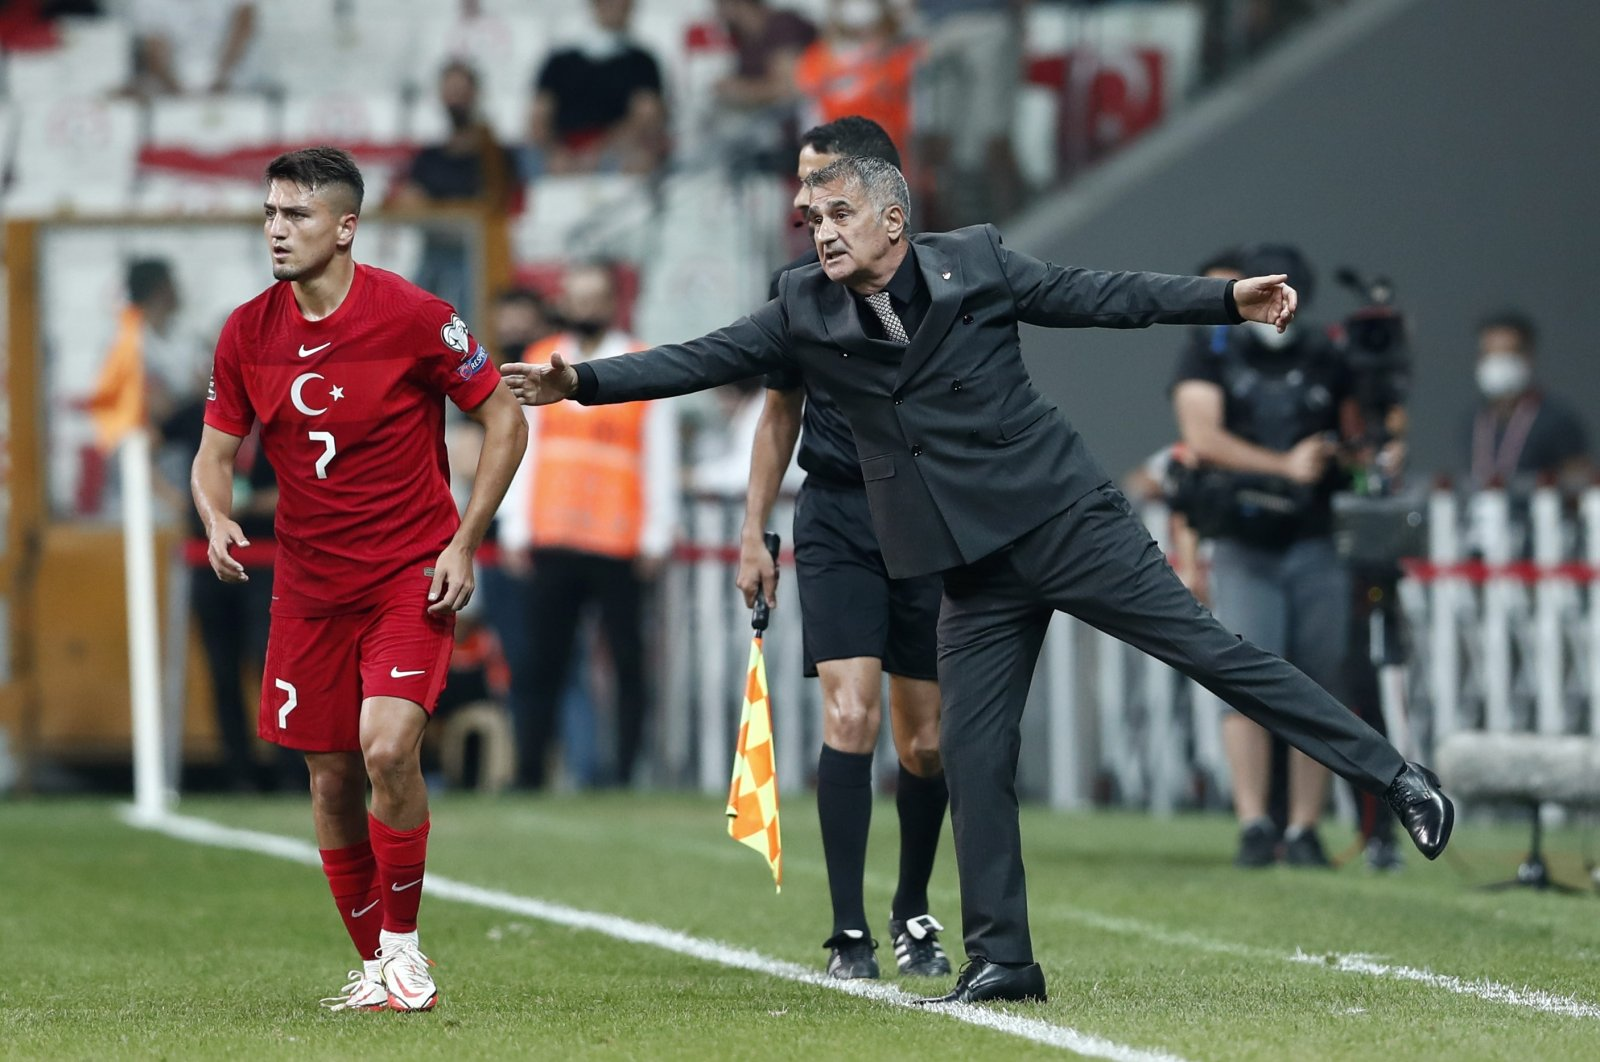 Turkey coach Şenol Güneş talks to Cengiz Ünder during a World Cup 2022 European qualifier match against Montenegro at Vodafone Park, Istanbul, Turkey, Sept. 1, 2021.